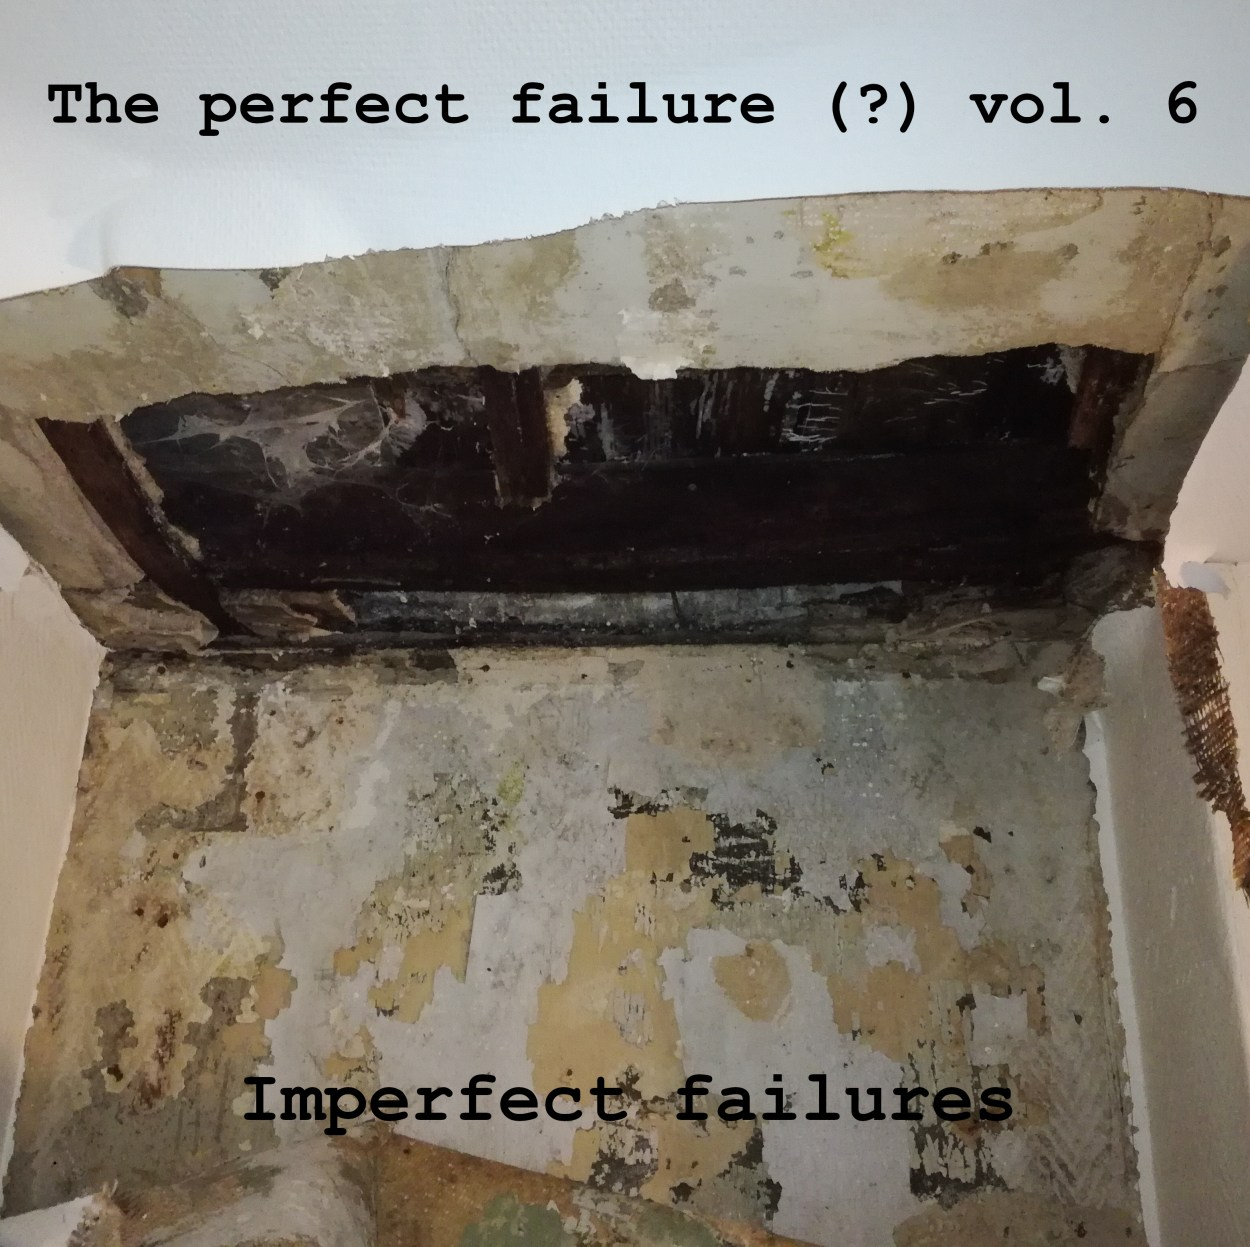 The perfect failure (?) – The perfect failure (?) vol. 6 : Imperfect failures